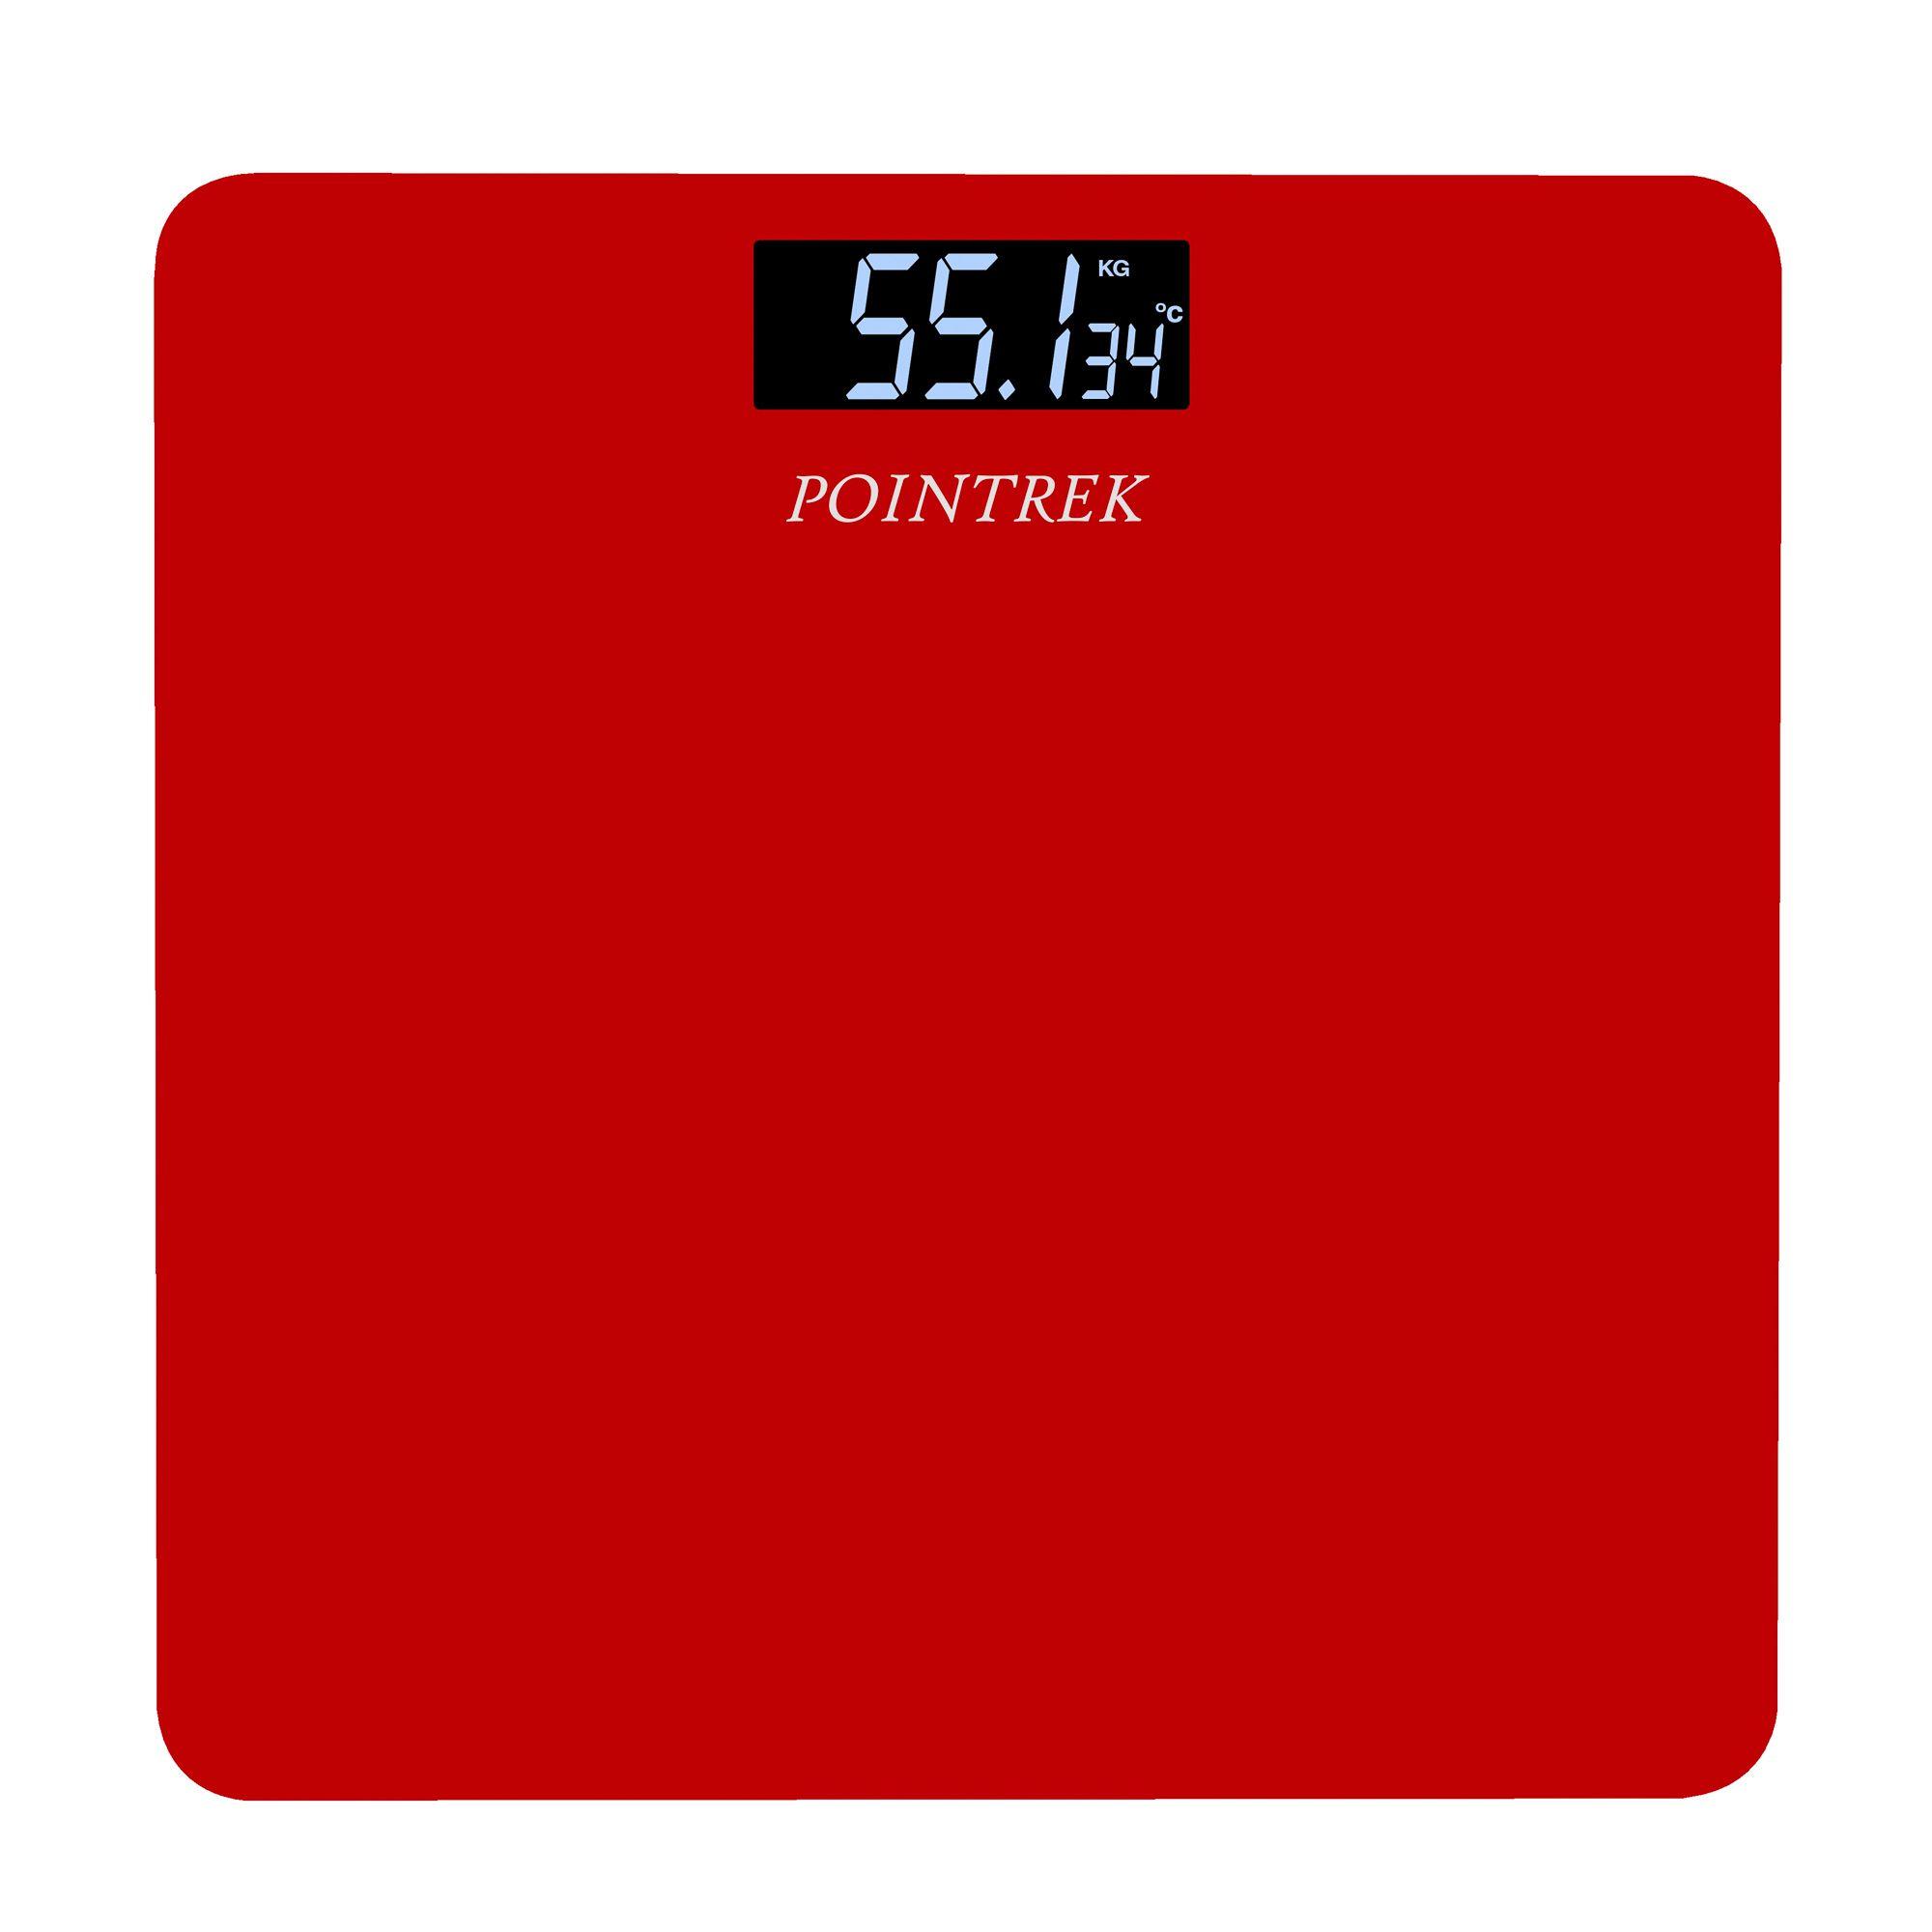 Pointrek Venus PS-101-Red-Digital Electronic Personal Body